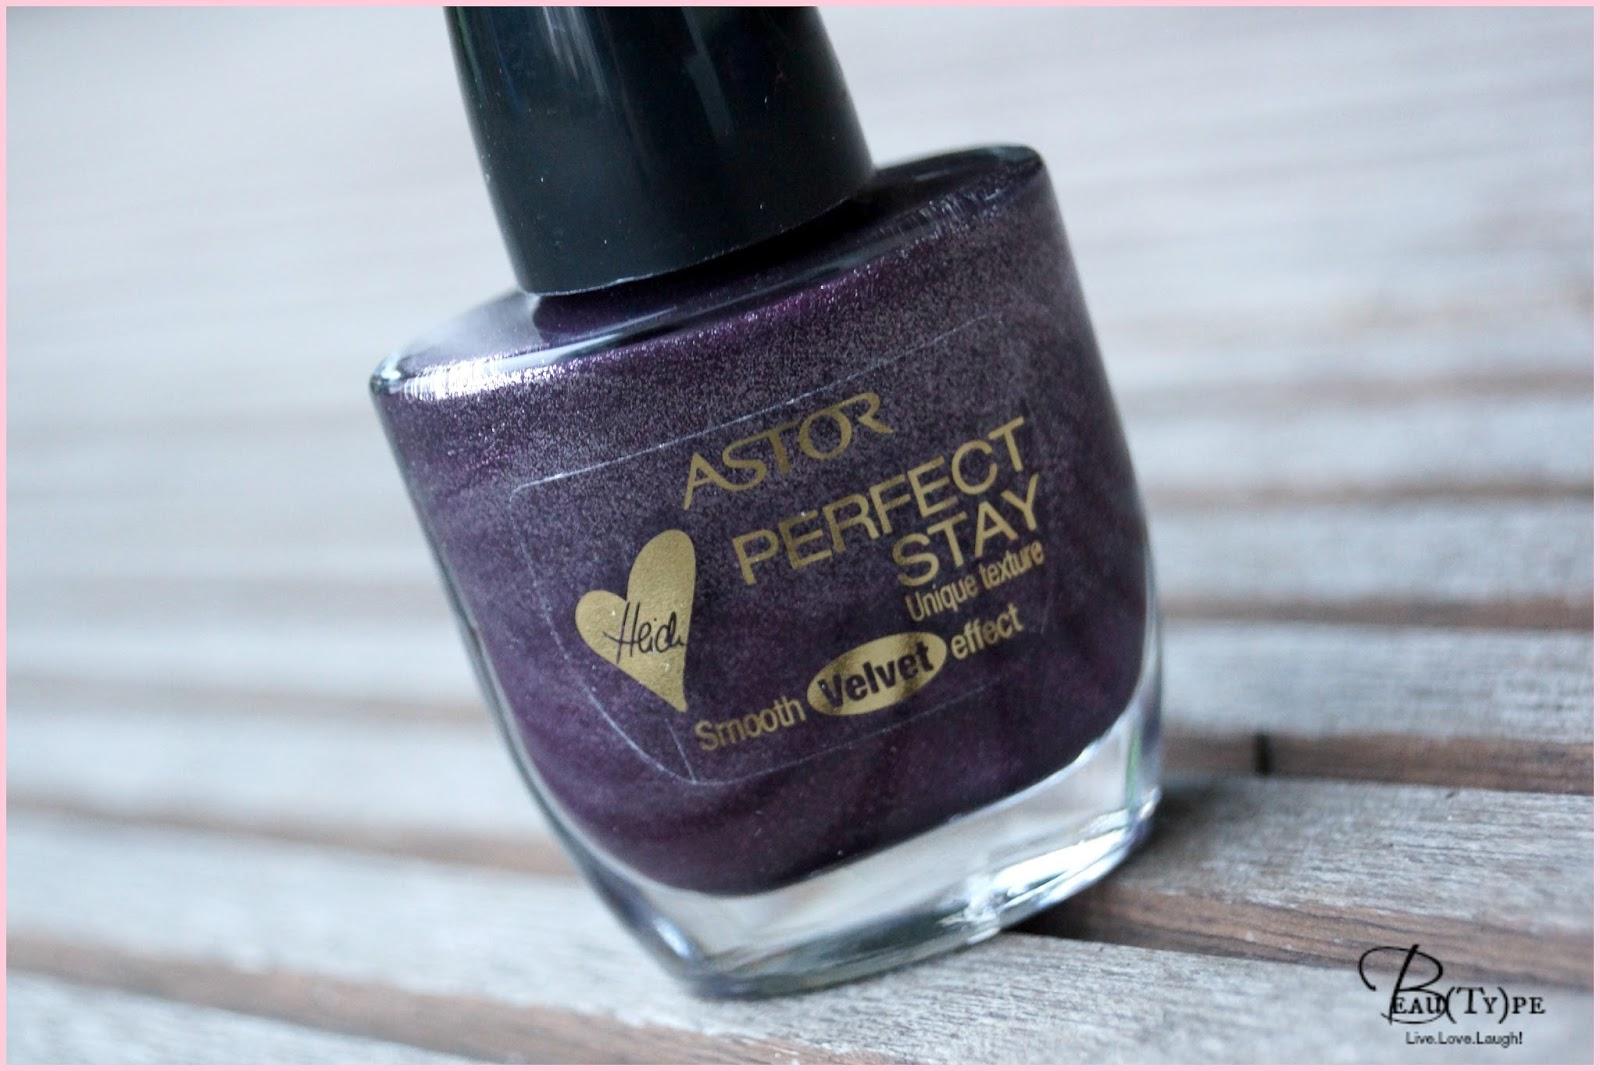 beau ty pe lacke in farbe und bunt violett. Black Bedroom Furniture Sets. Home Design Ideas